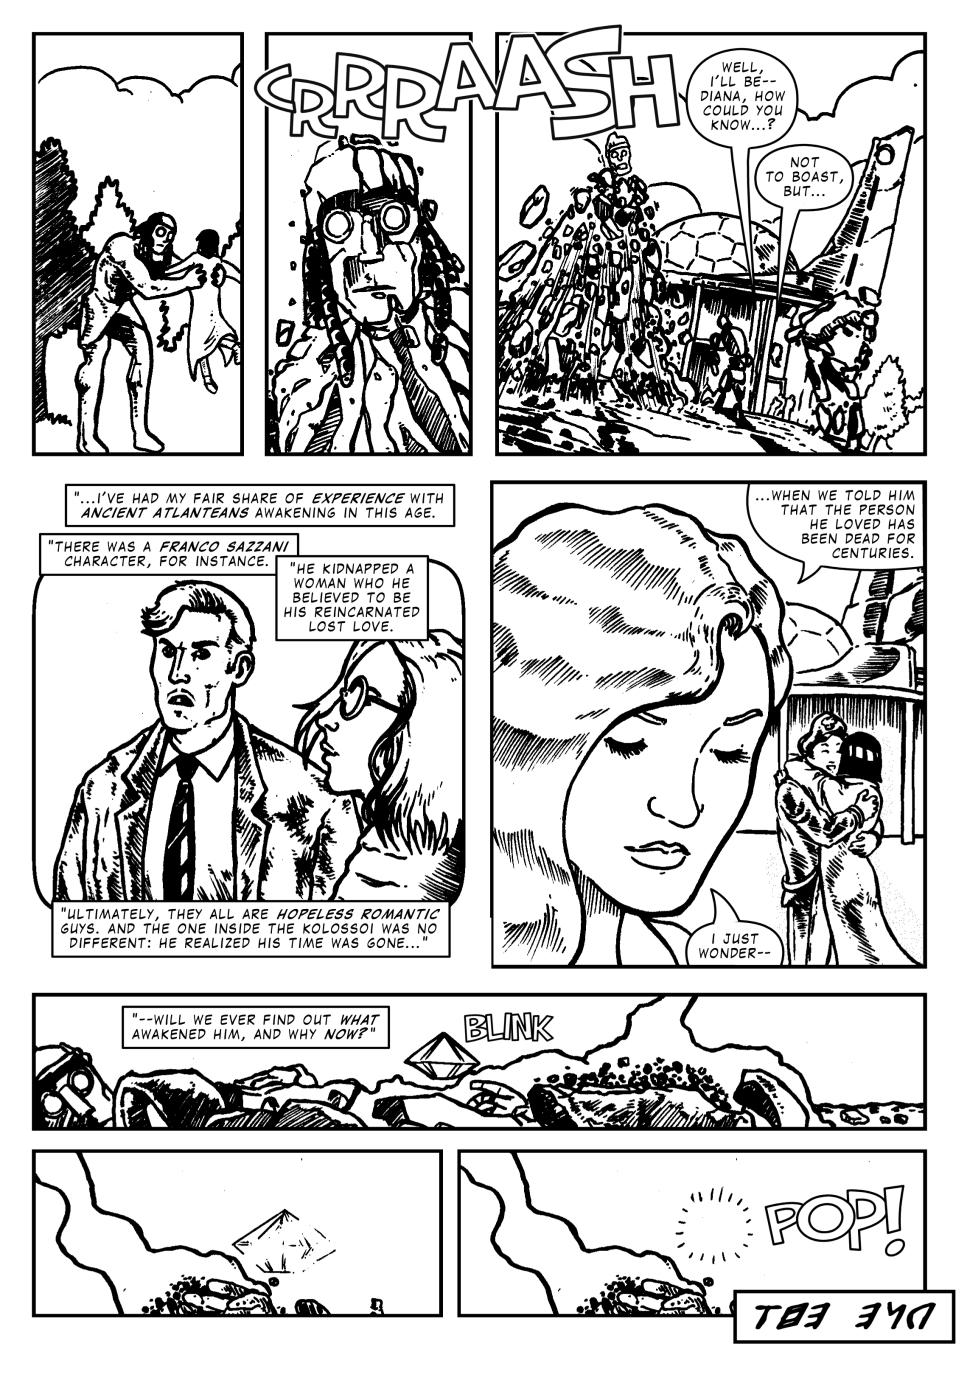 GaL #7 - The Giants of Mont'E Prama (2) - p5